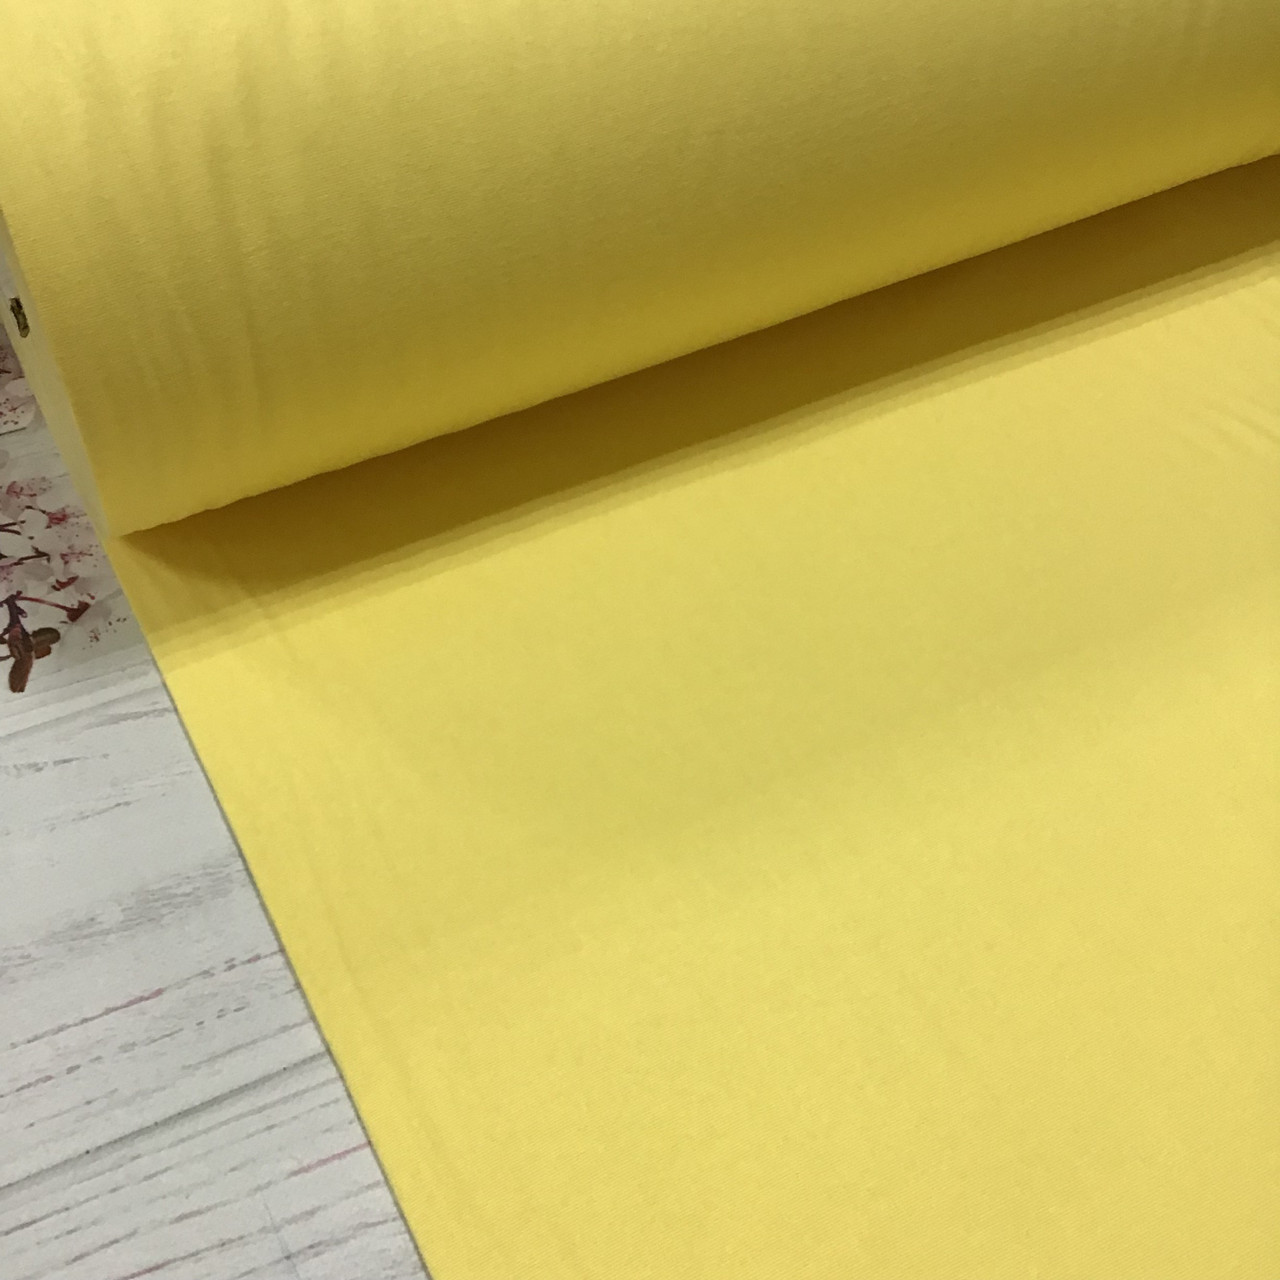 Фланелевая ткань желтая однотонная (шир. 2,4 м)